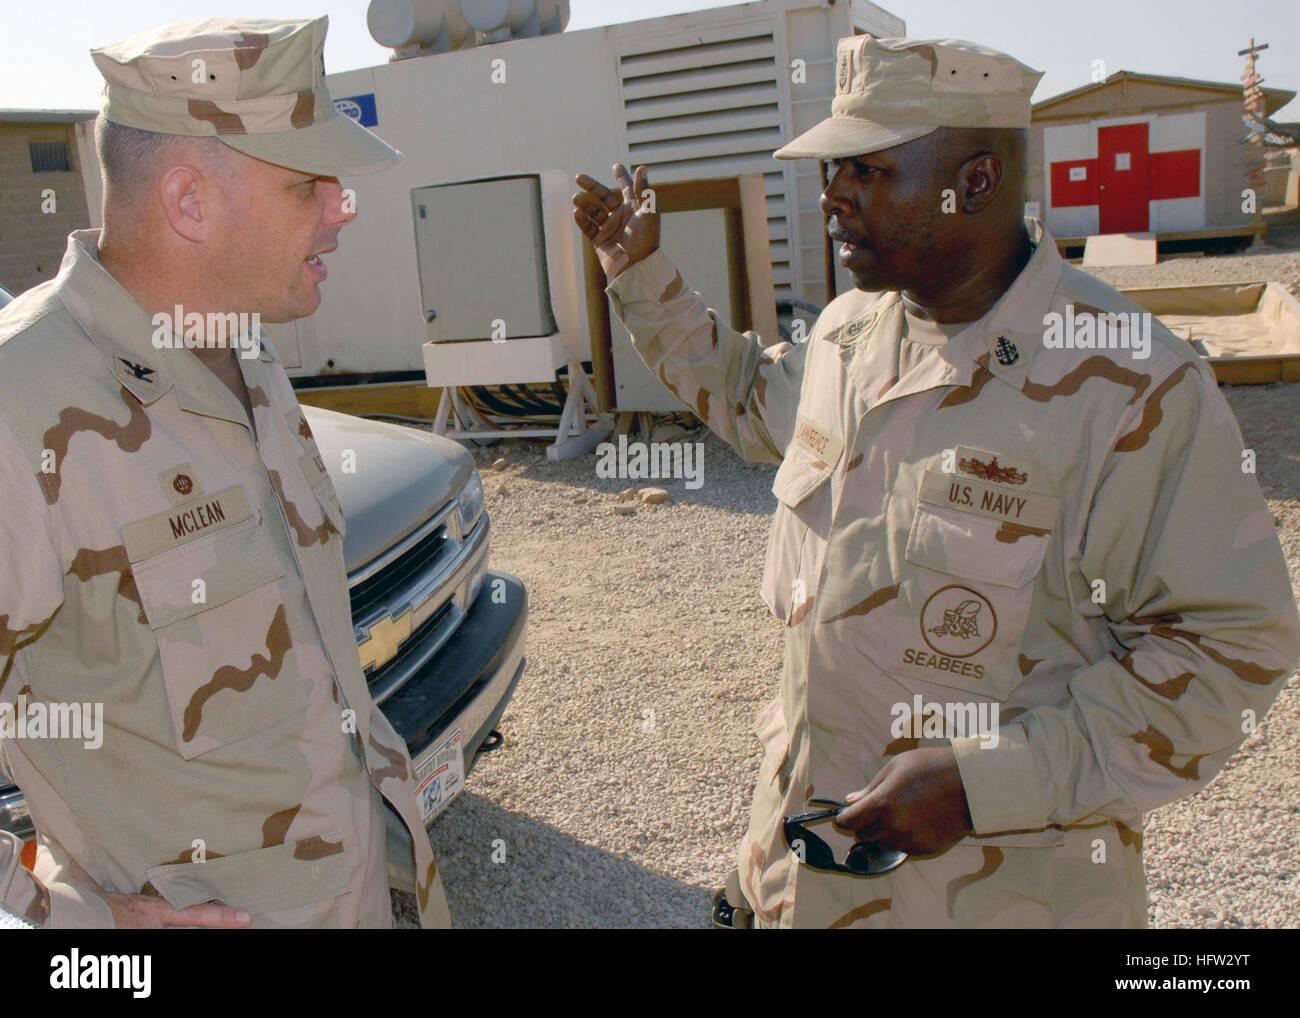 071114-N-0553R-001 AR RAMADI, Iraq (Nov. 14, 2007) Capt. Robert A. McLean, commander, Naval Construction Regiment Stock Photo